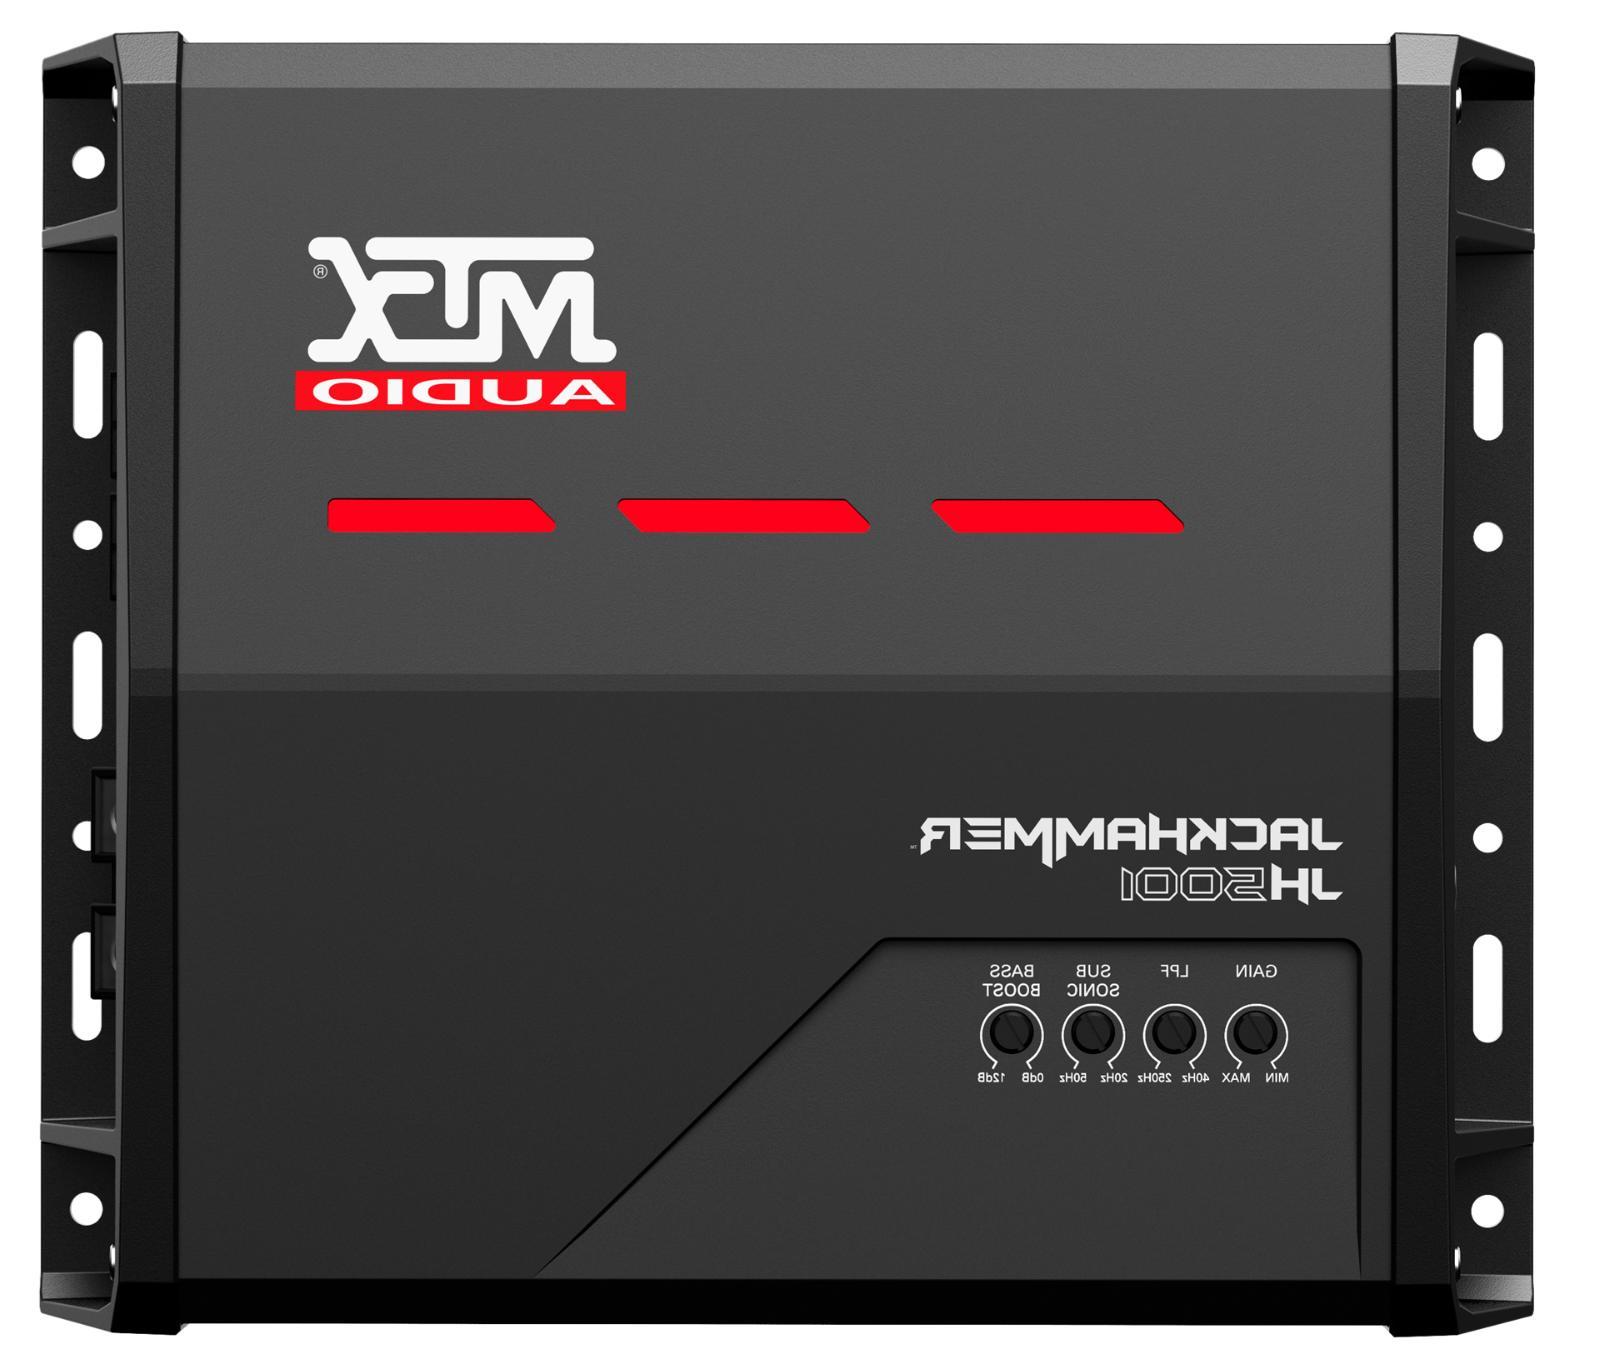 audio jh5001 jackhammer 1 channel subwoofer amplifier